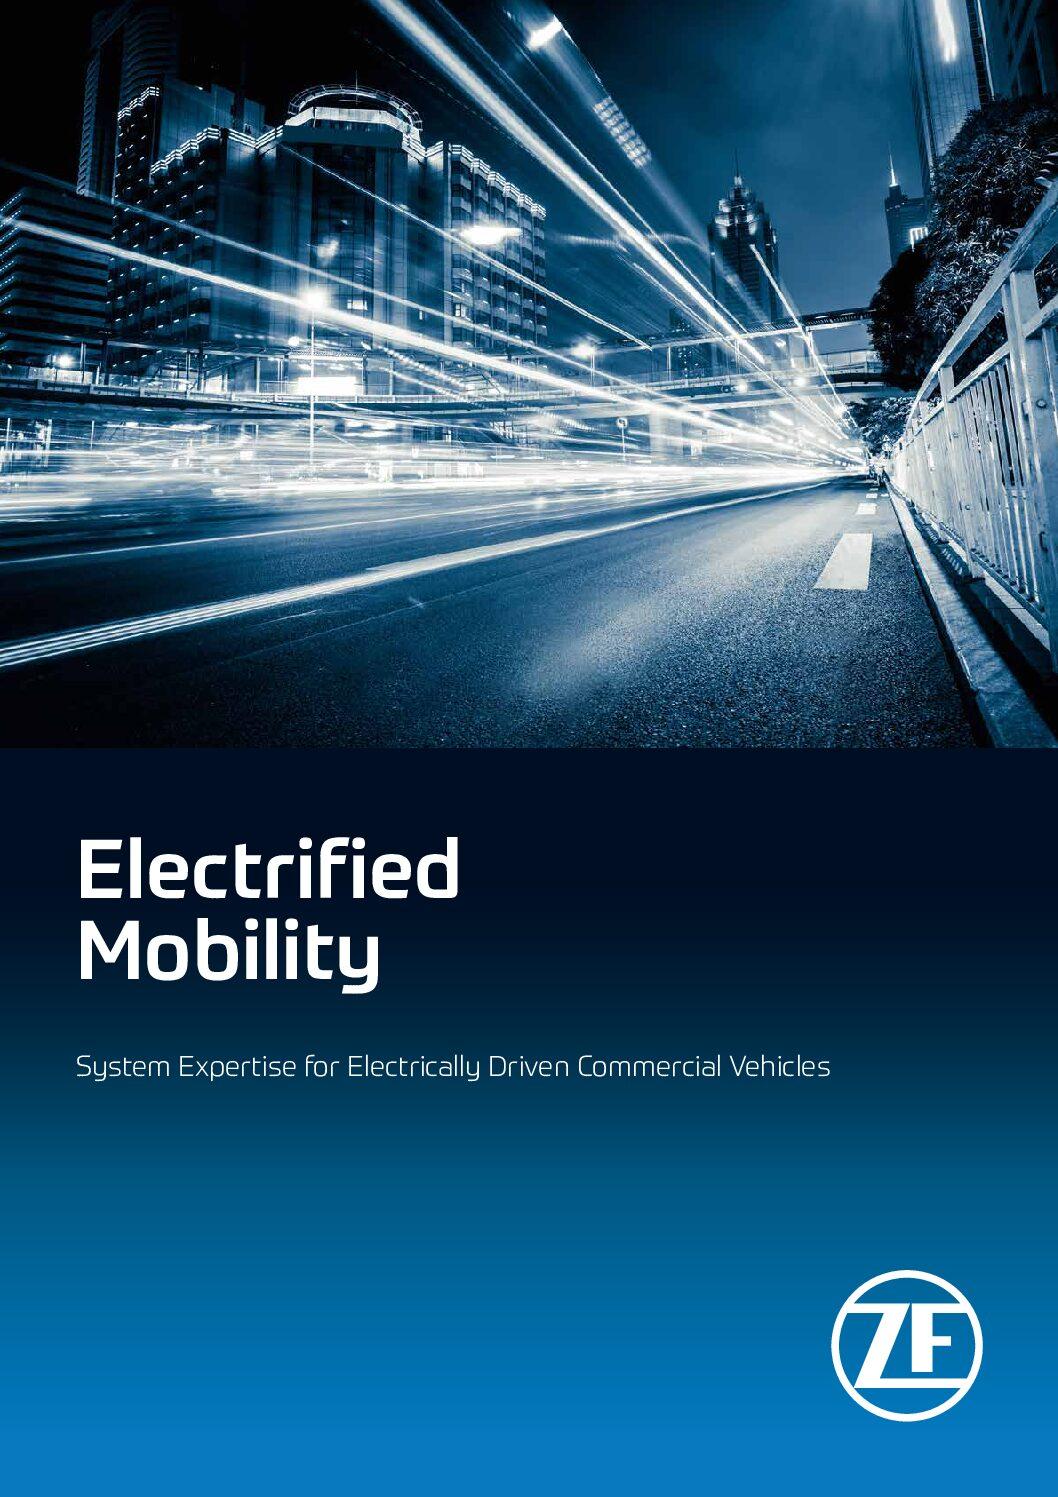 ZF Emission-Free Electrified Mobility